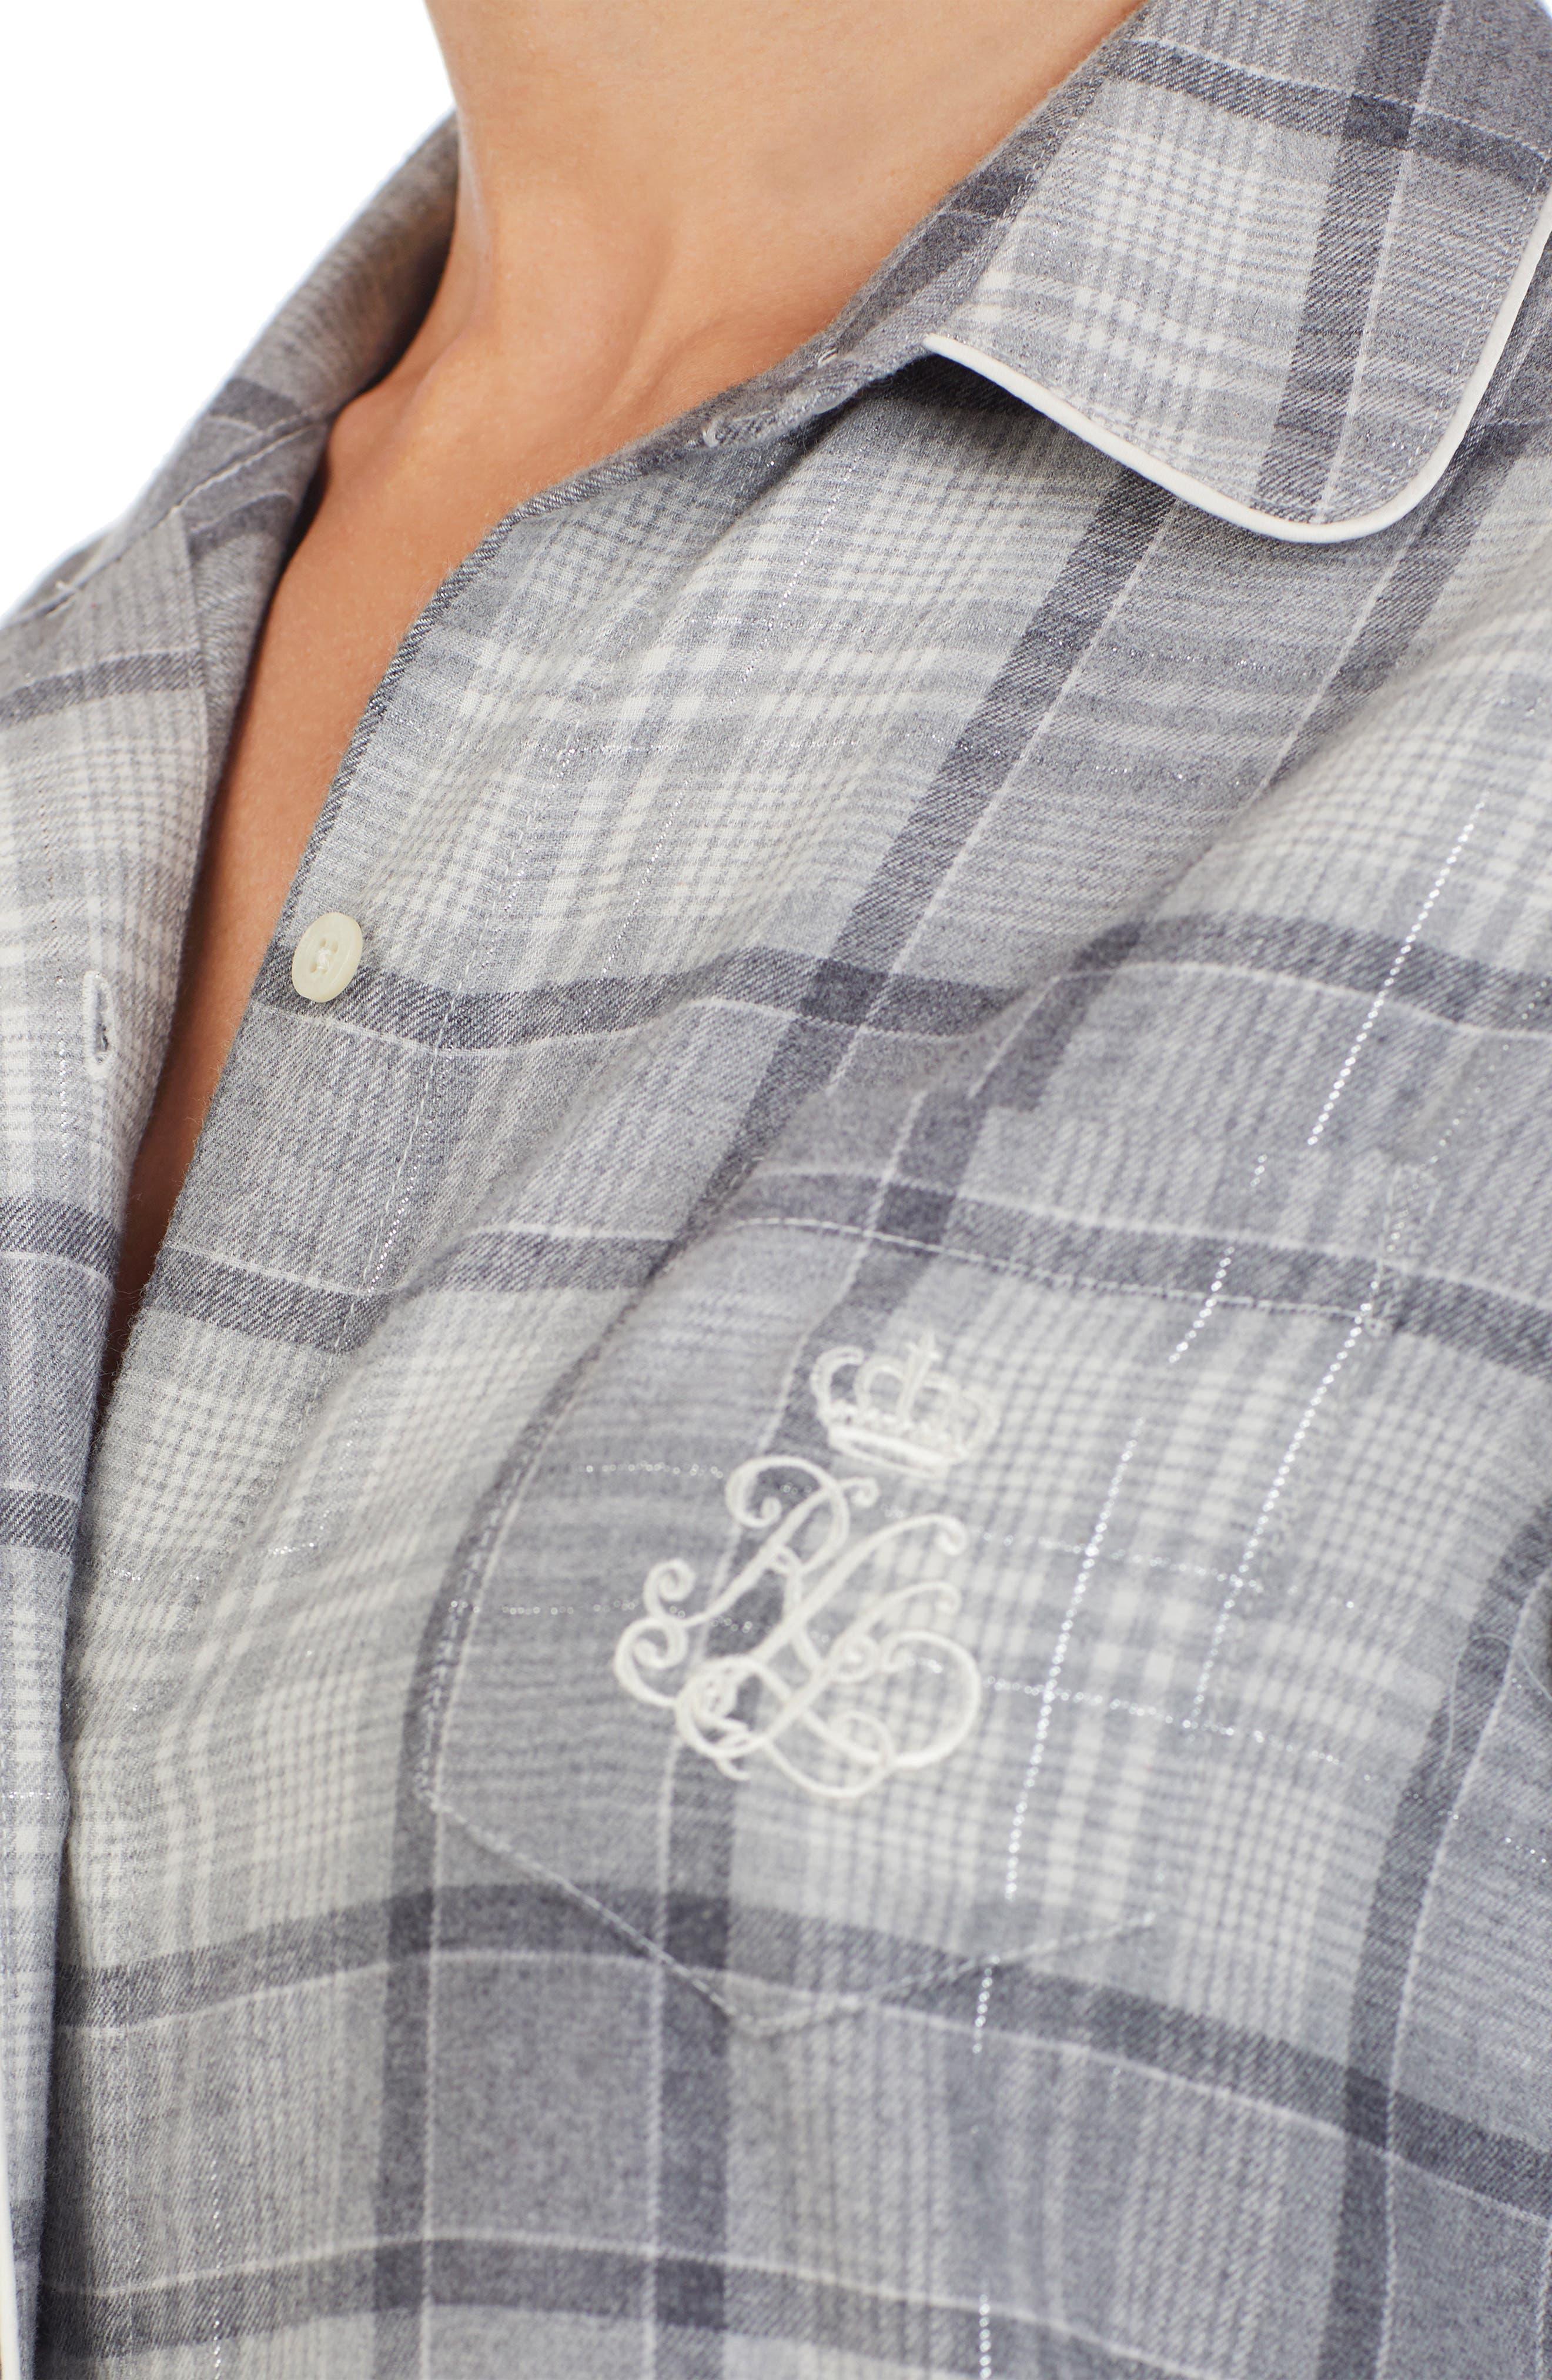 Plaid Flannel Sleep Shirt,                             Alternate thumbnail 3, color,                             GREY PLAID